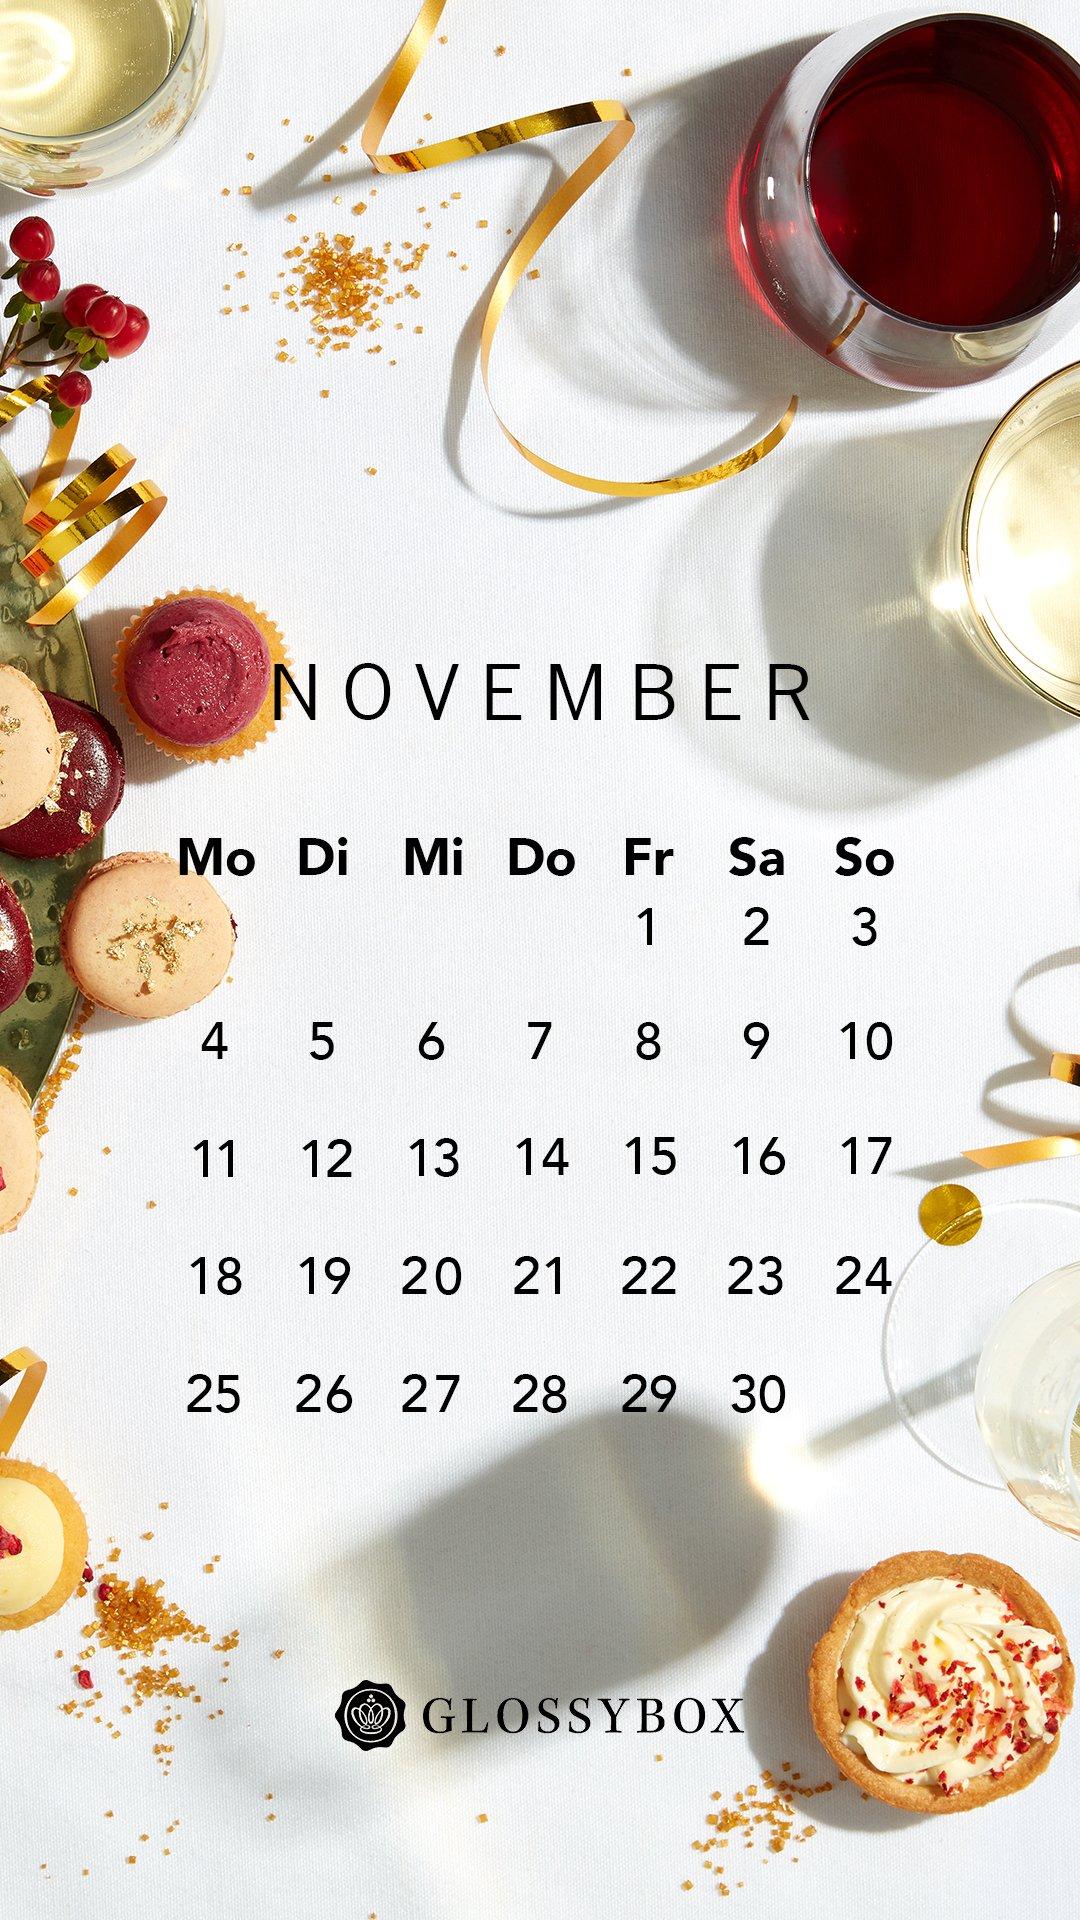 Screensaver-November-Gold-and-champagne-glossybox